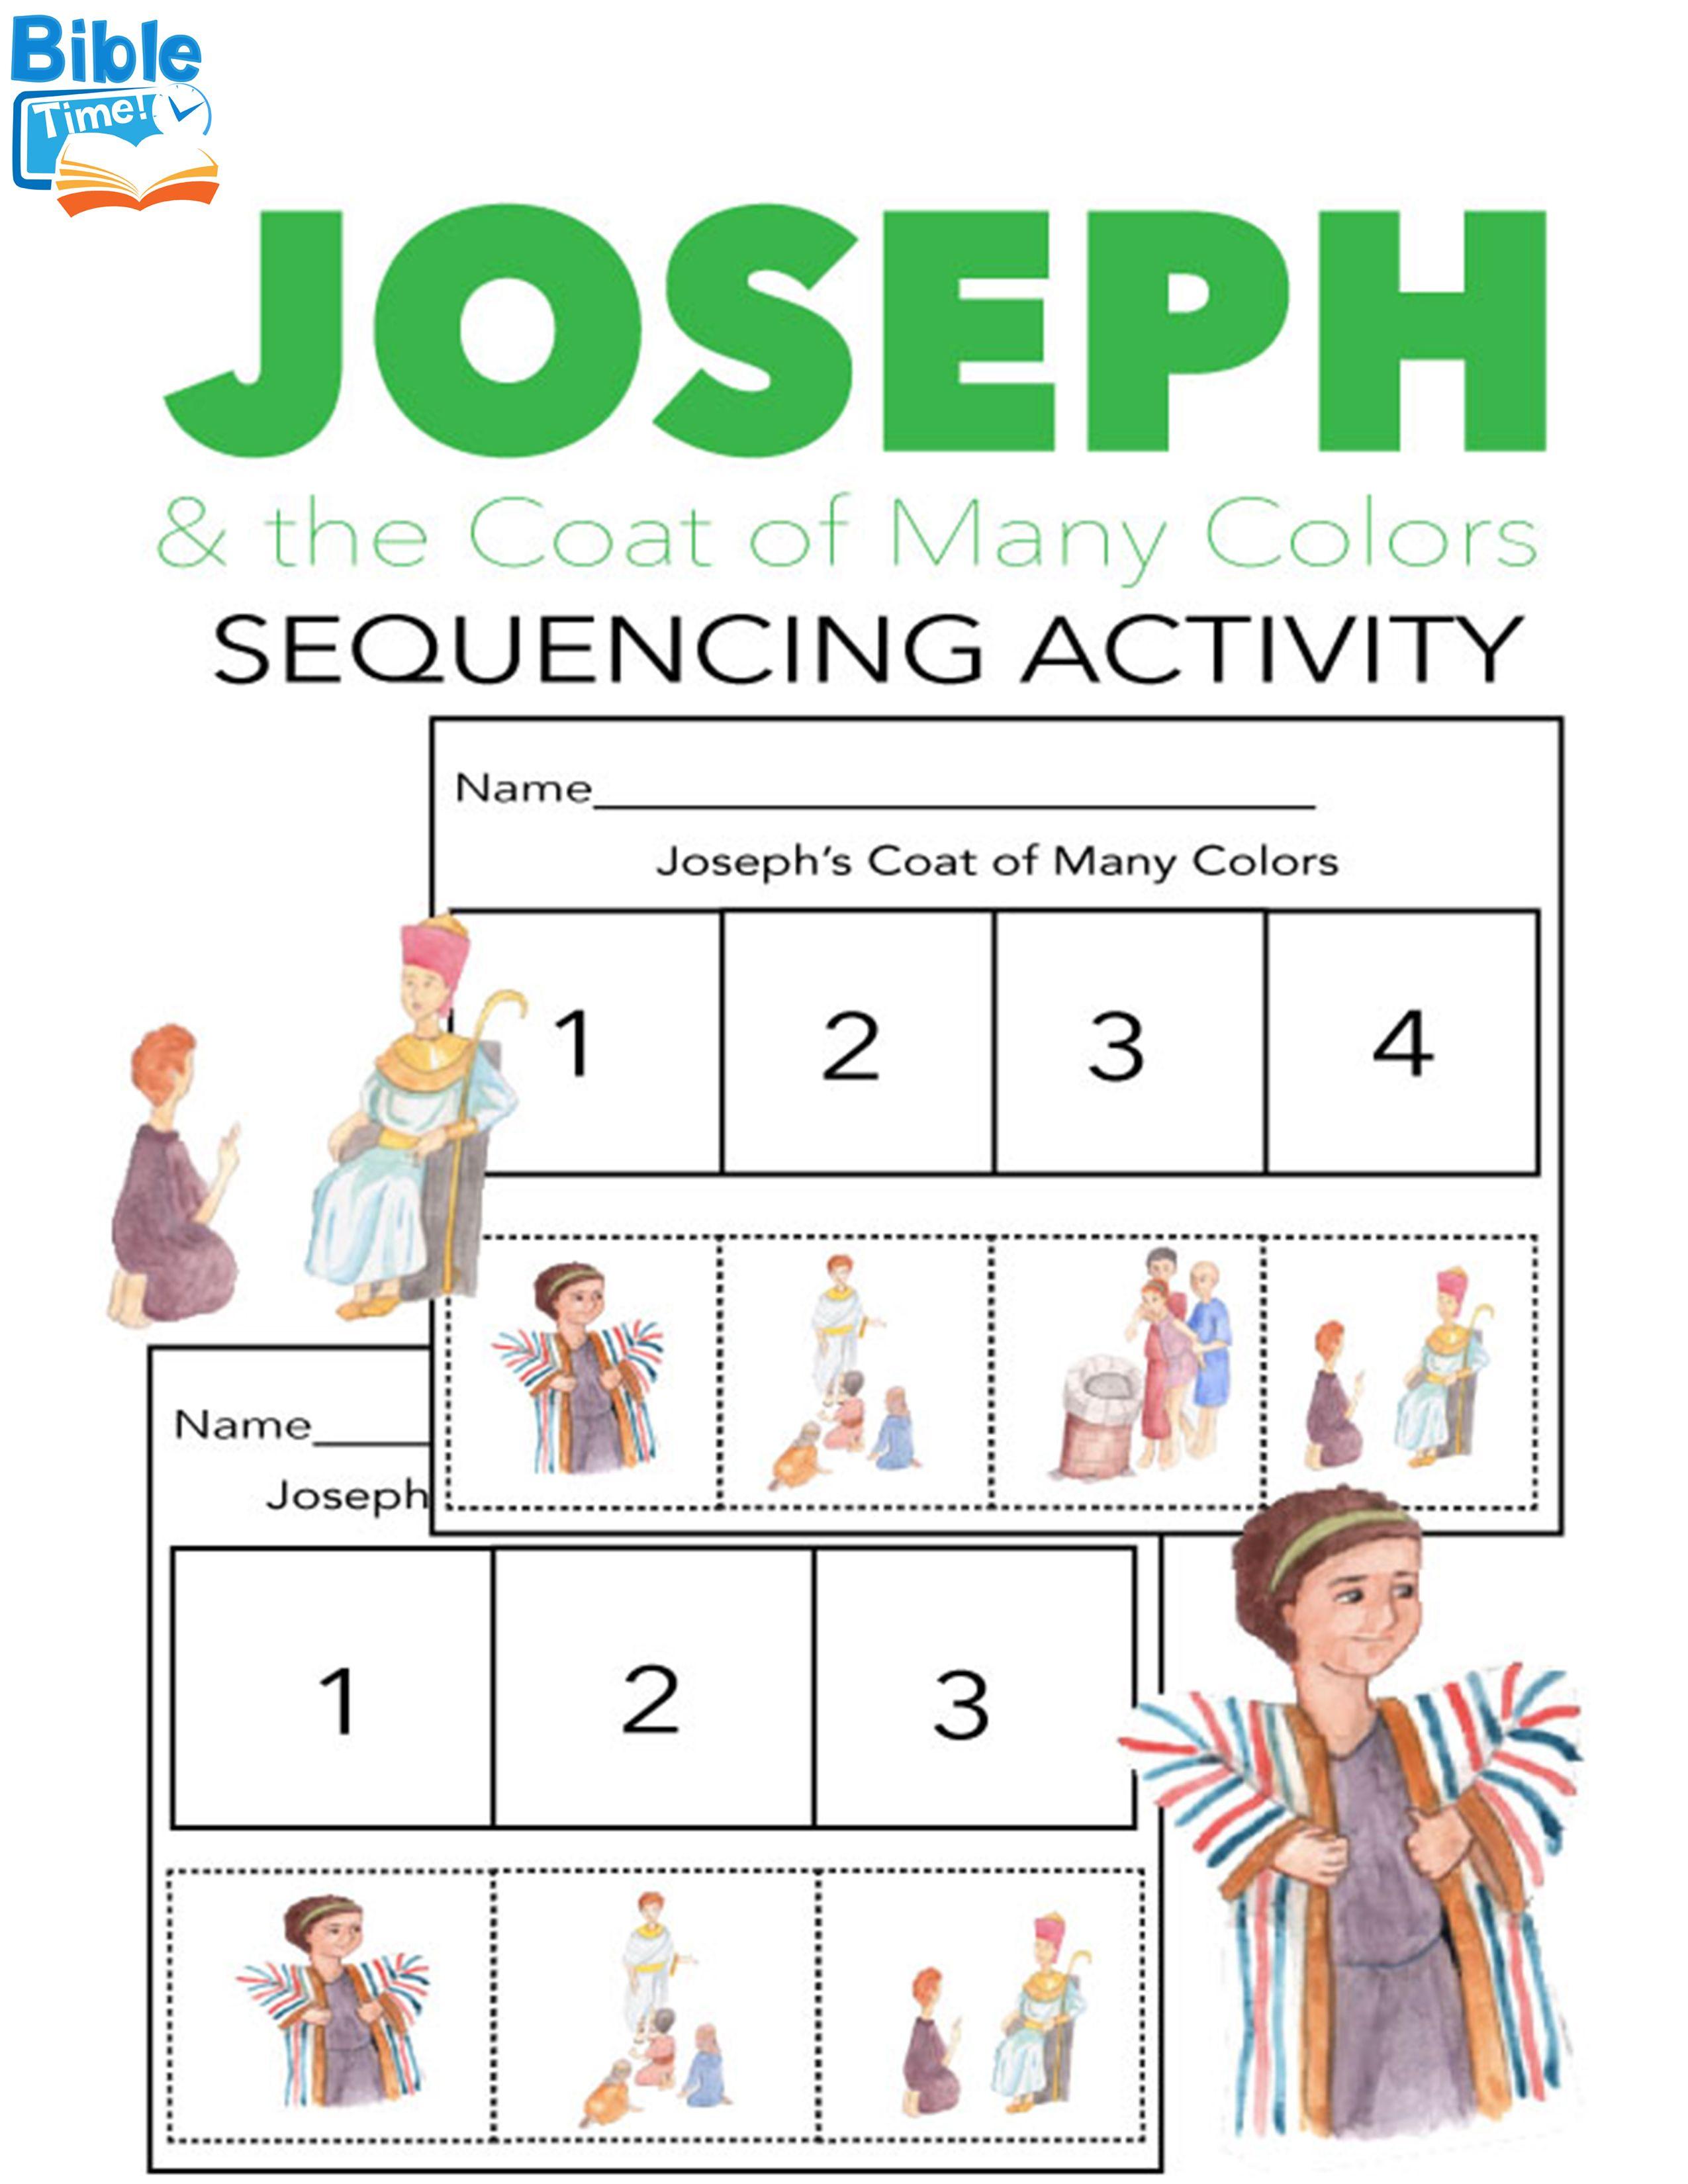 The Bible Story Of Joseph Sequencing Activity This Kids Bible Activity Will Teach Children Bible Lessons For Kids Bible Activities For Kids Sunday School Kids [ 3300 x 2550 Pixel ]